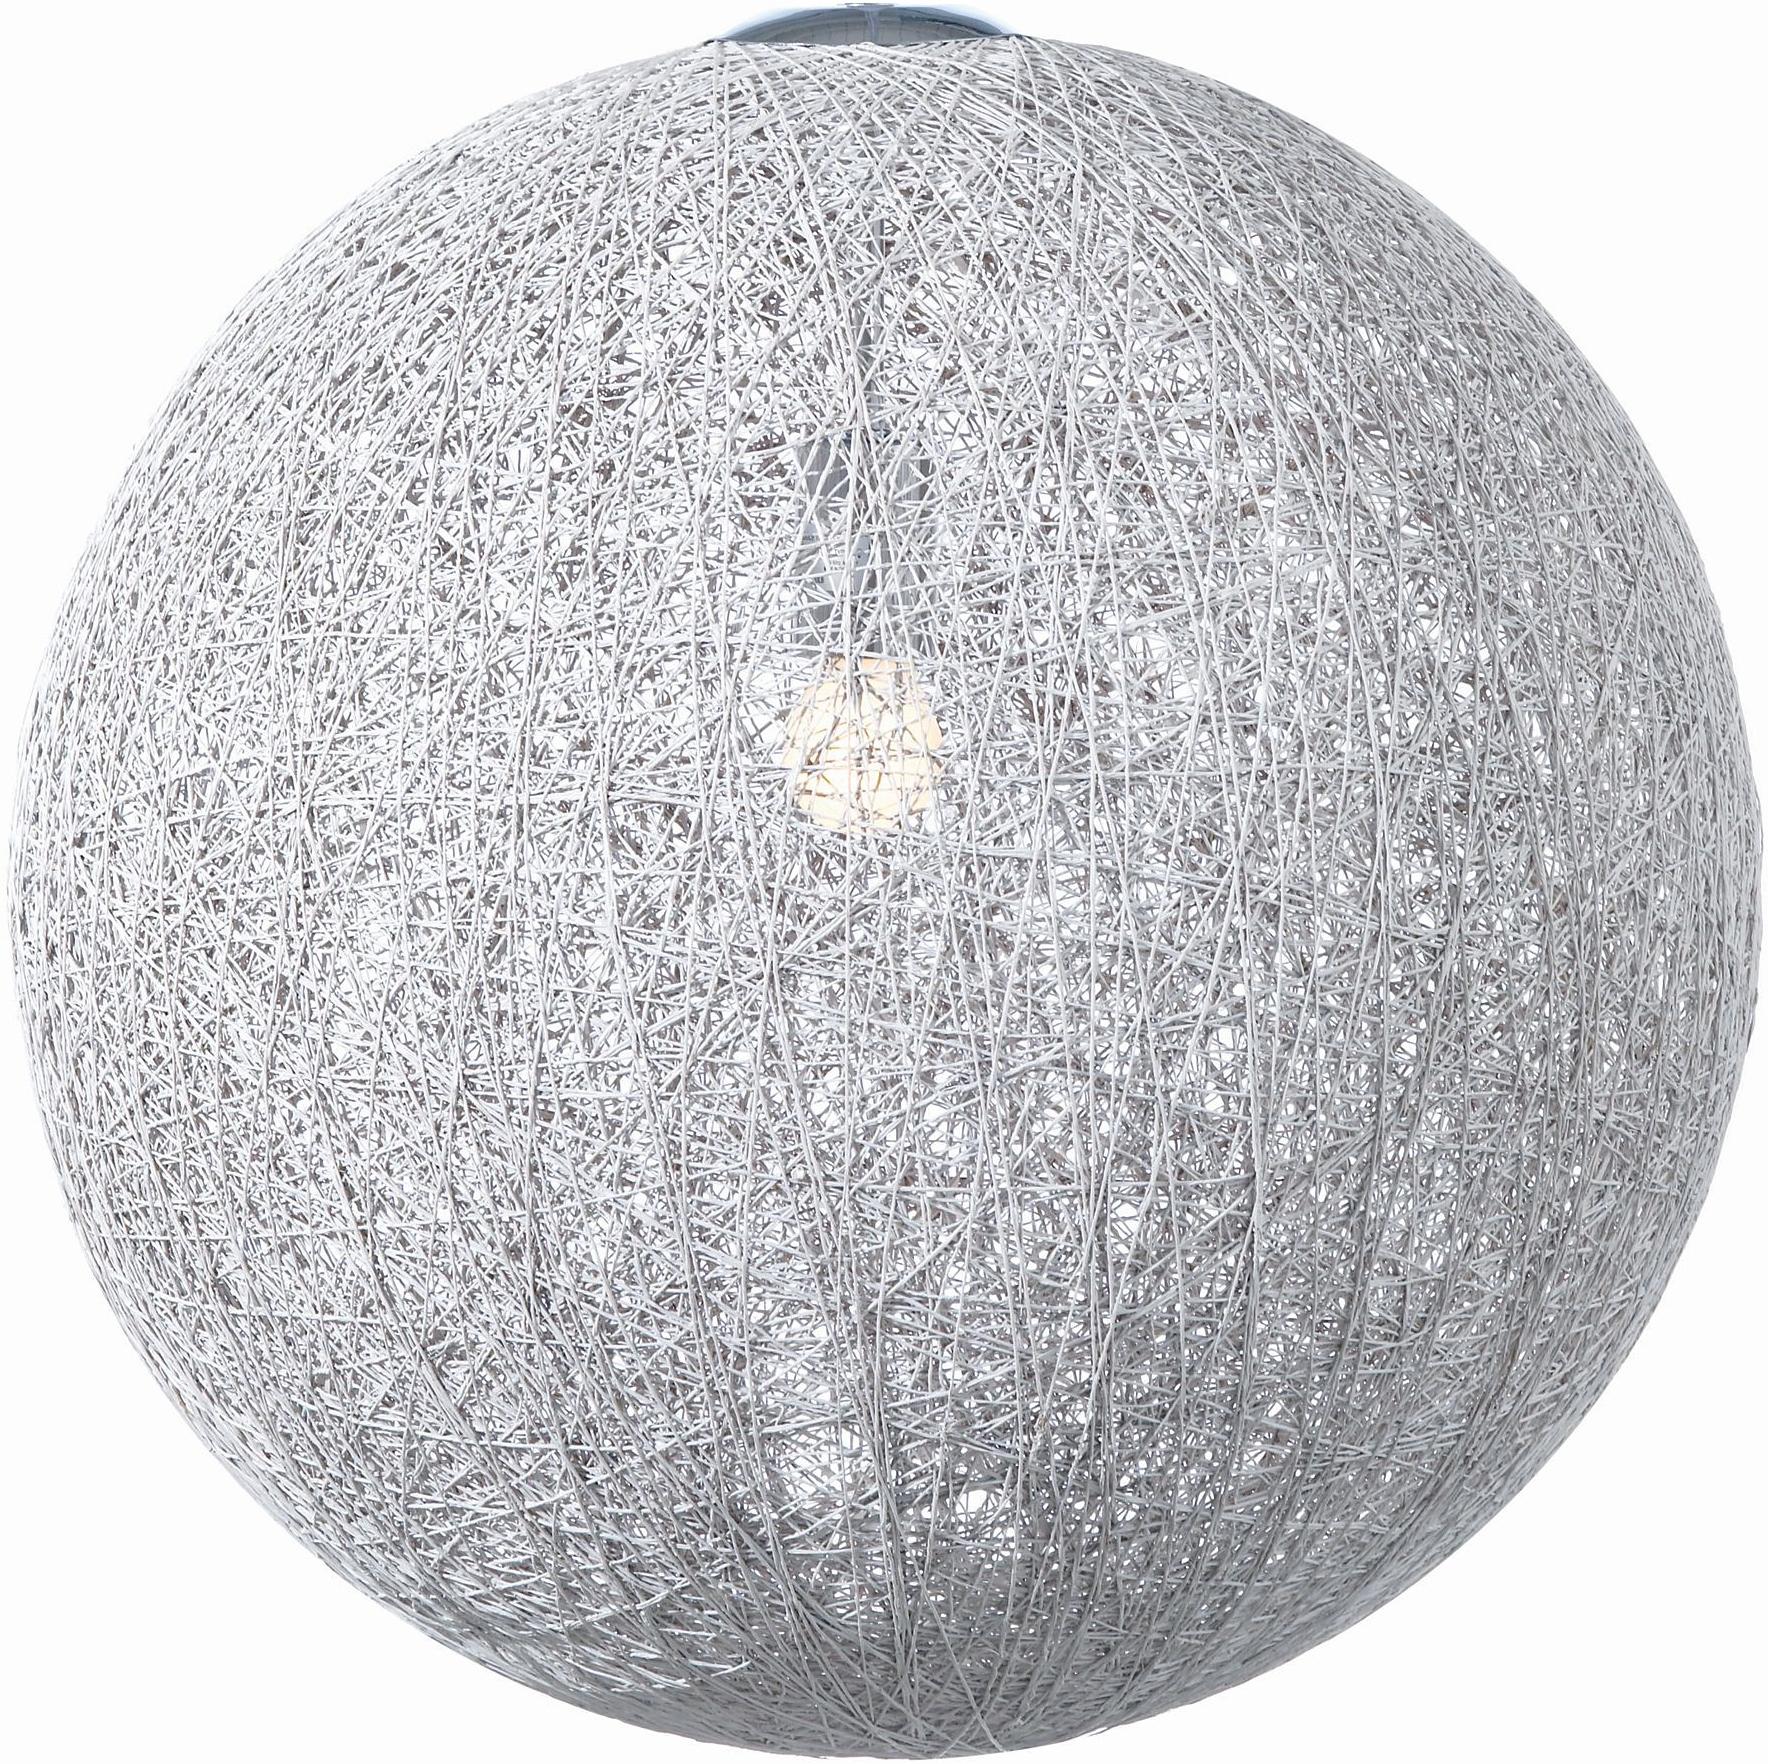 the nuevo living string pendant lamp in white